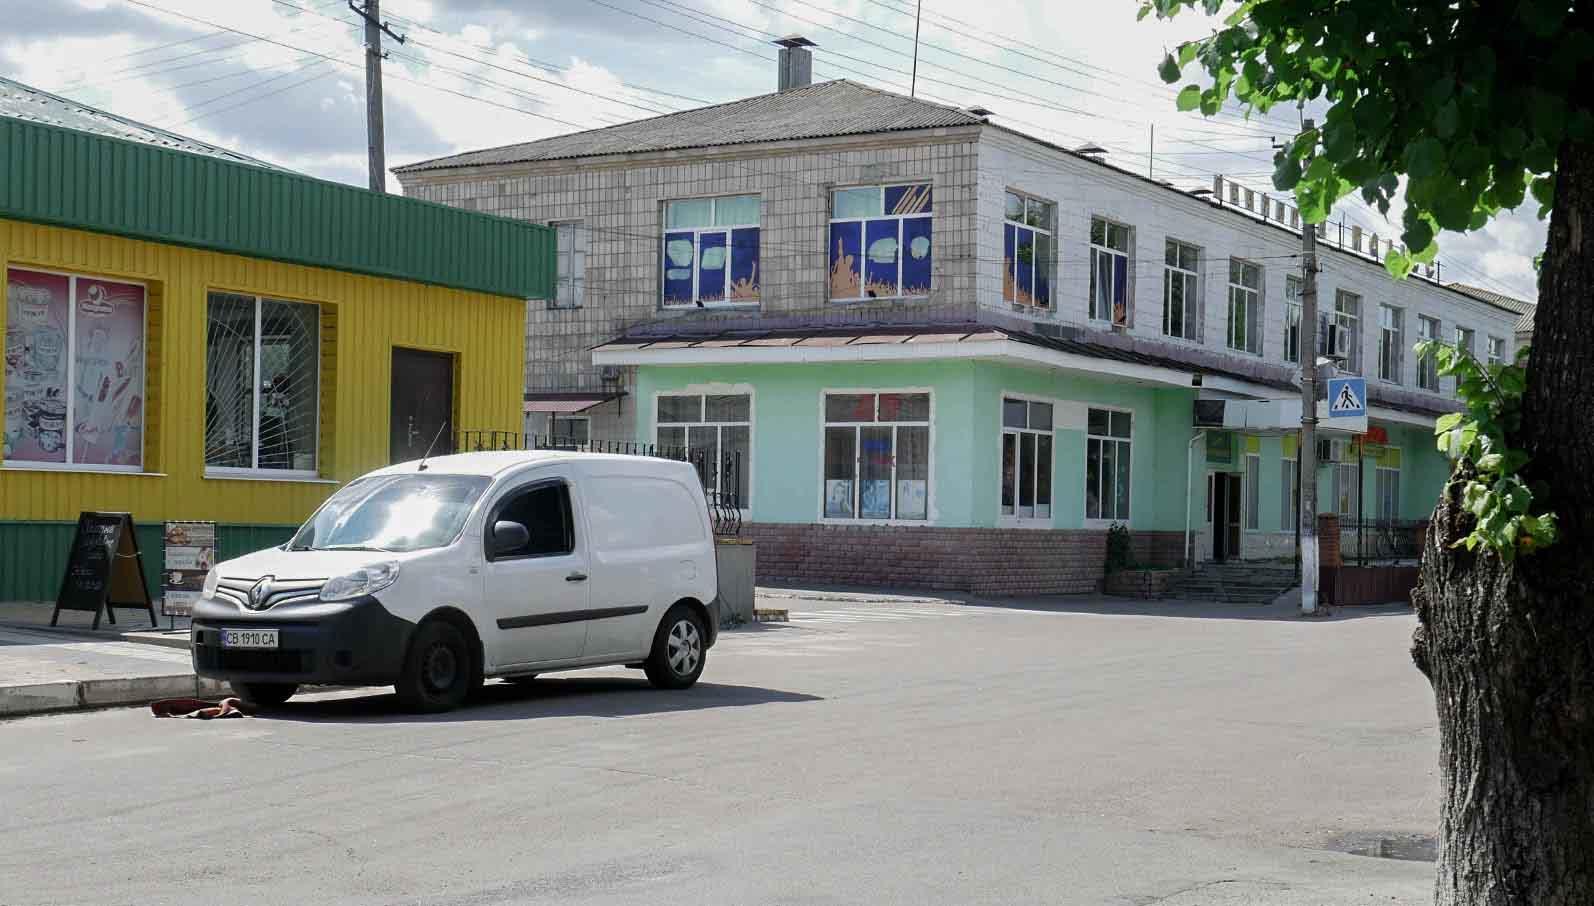 restoran 2 Стара Сосниця